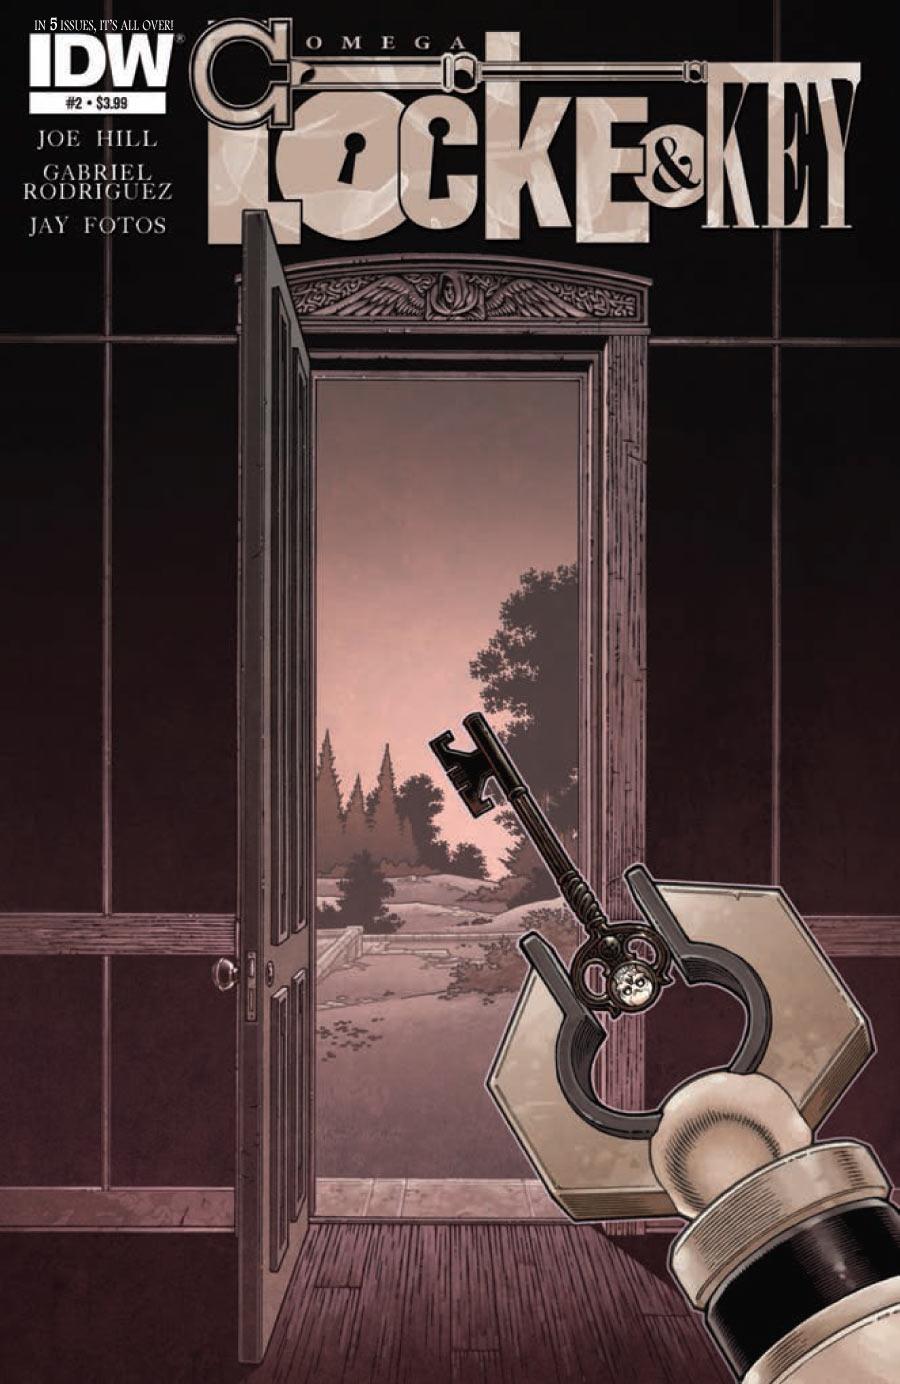 Locke & Key Omega #2 (of 7)